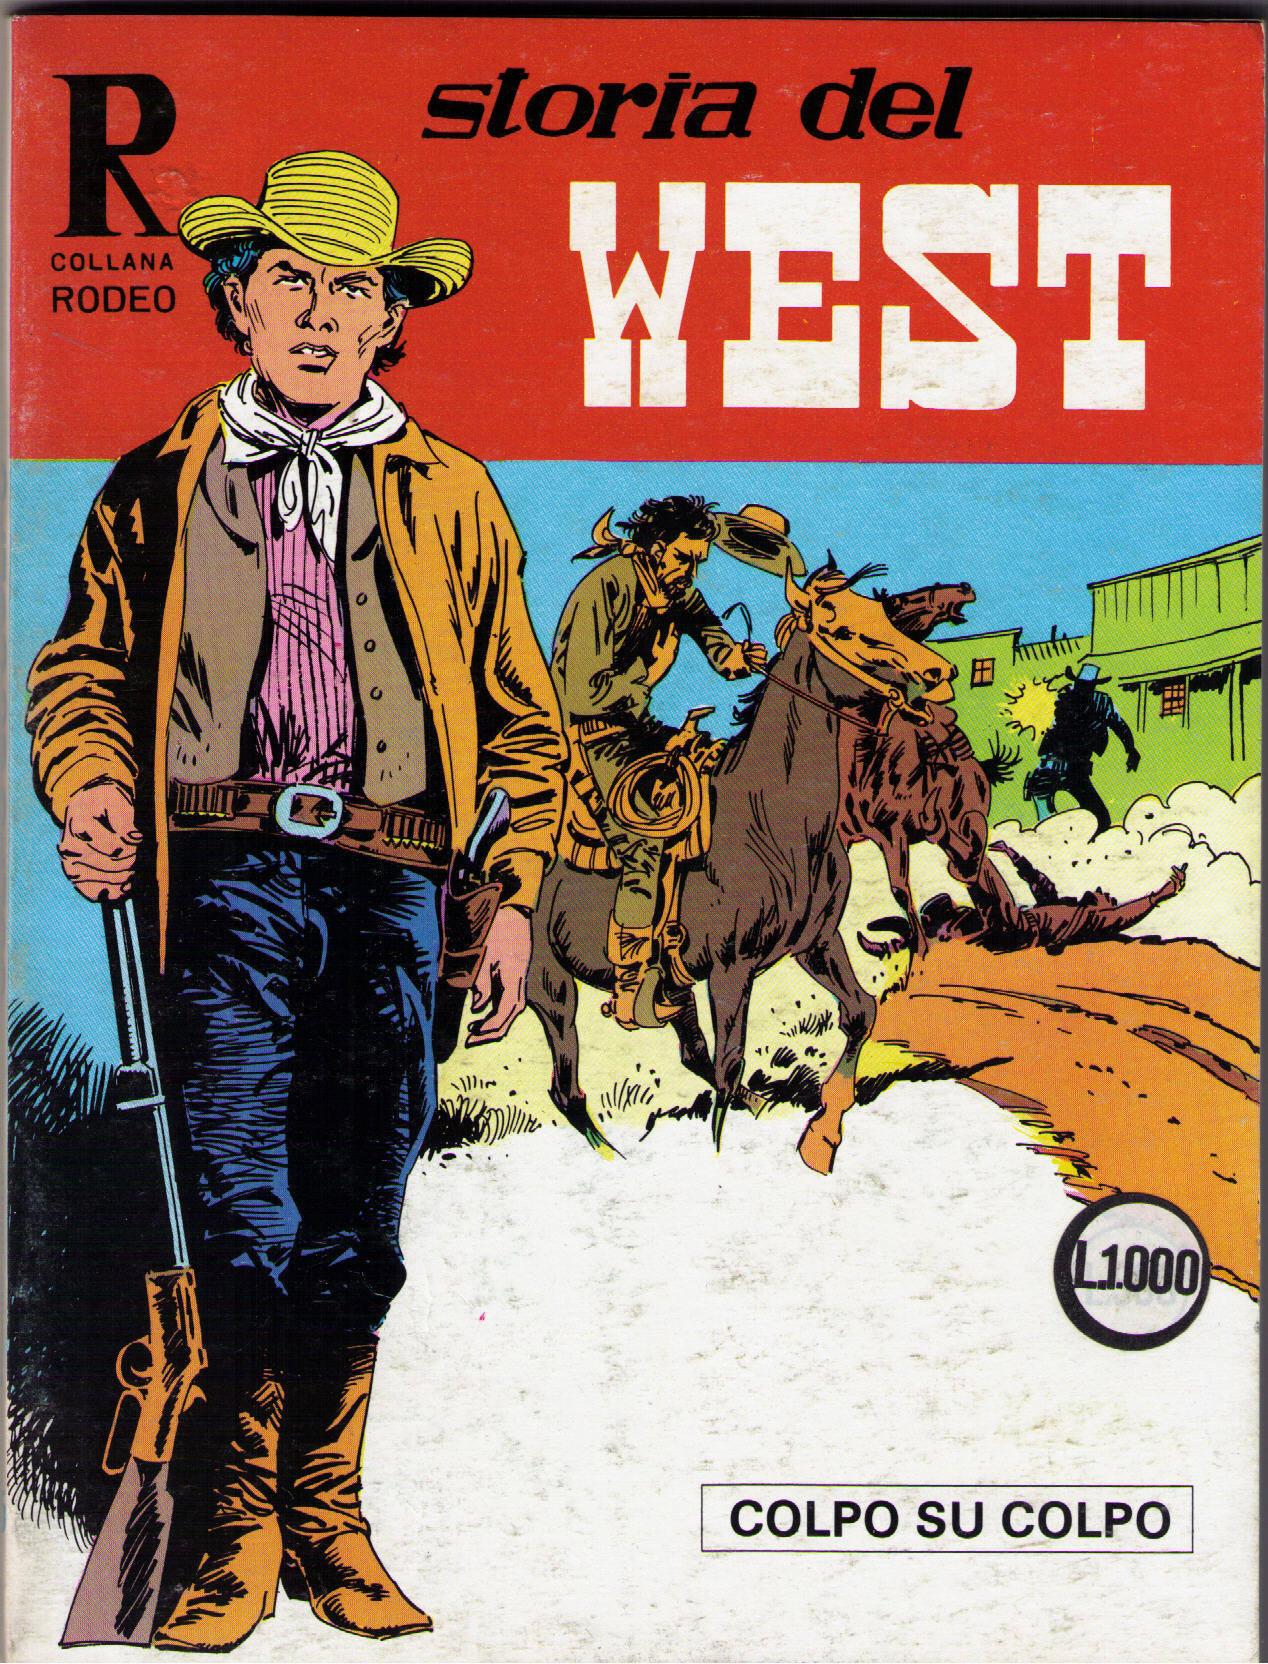 Storia del West n.67 (Collana Rodeo n. 155)